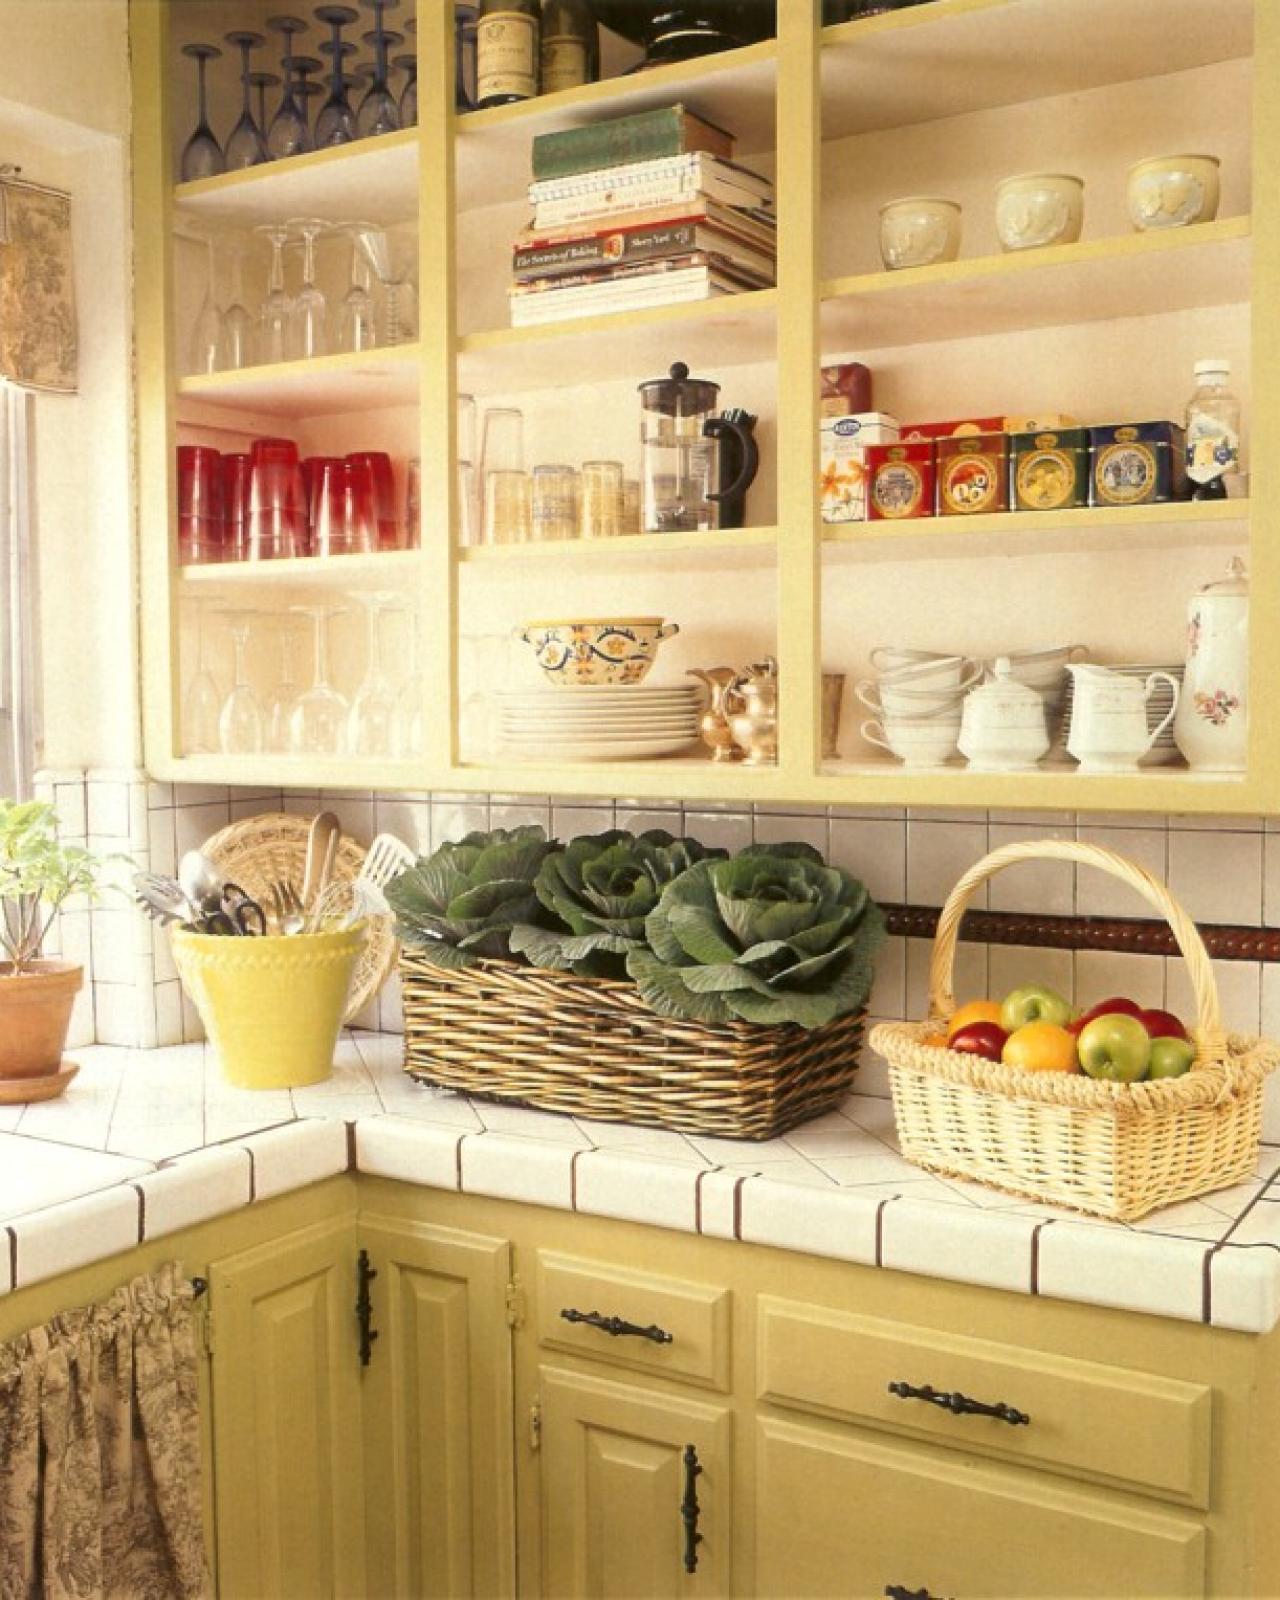 kitchen cabinets shelves ideas photo - 5